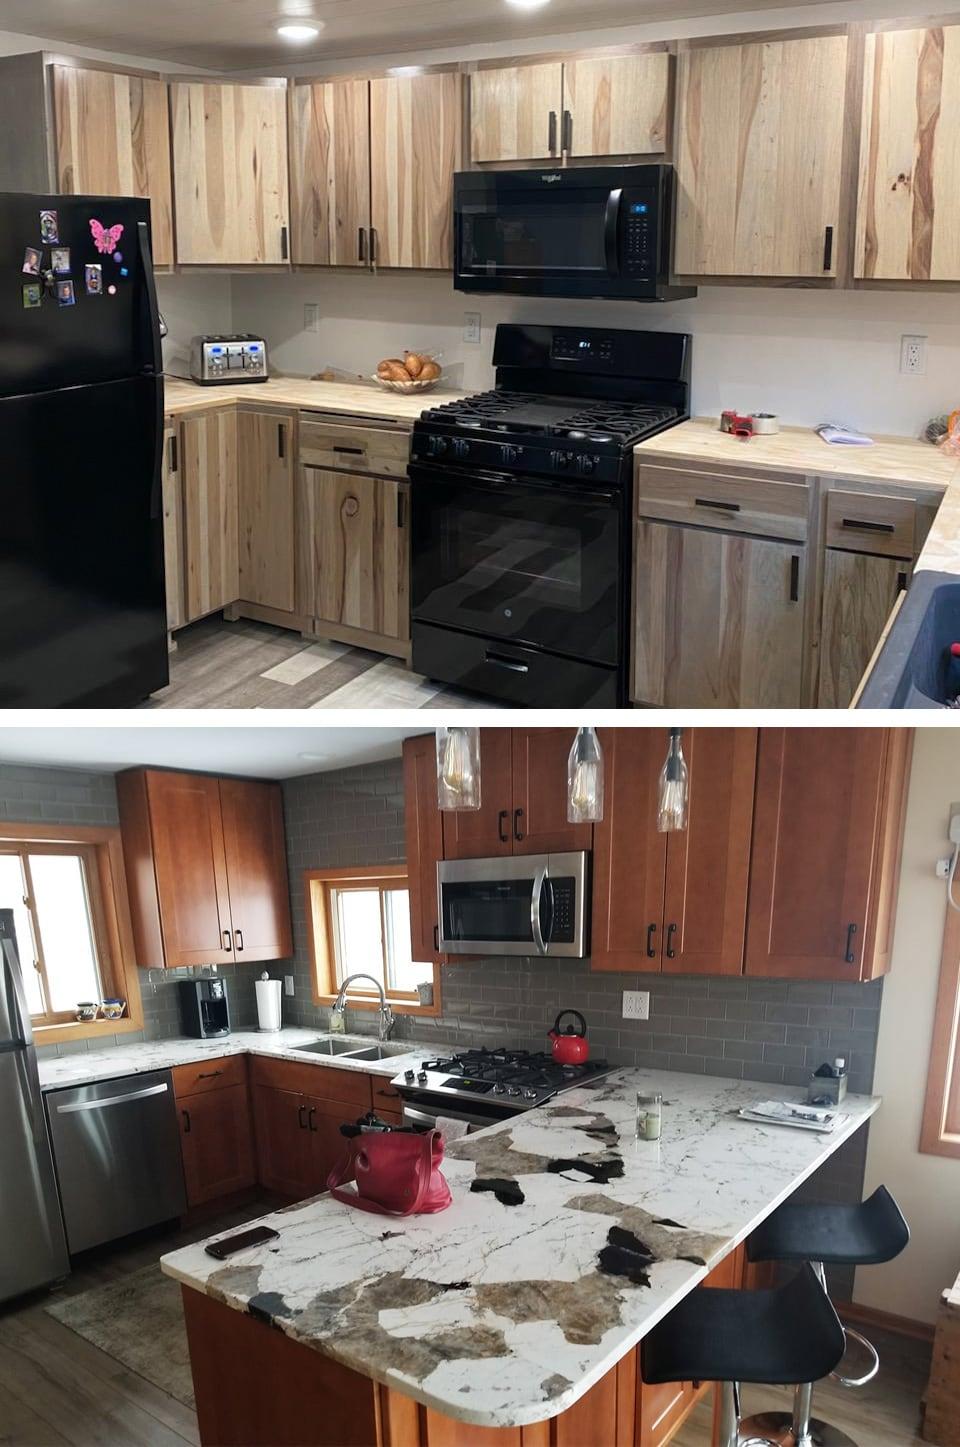 Remodeled Kitchen with custom cabinets in Keweenaw Peninsula Michigan